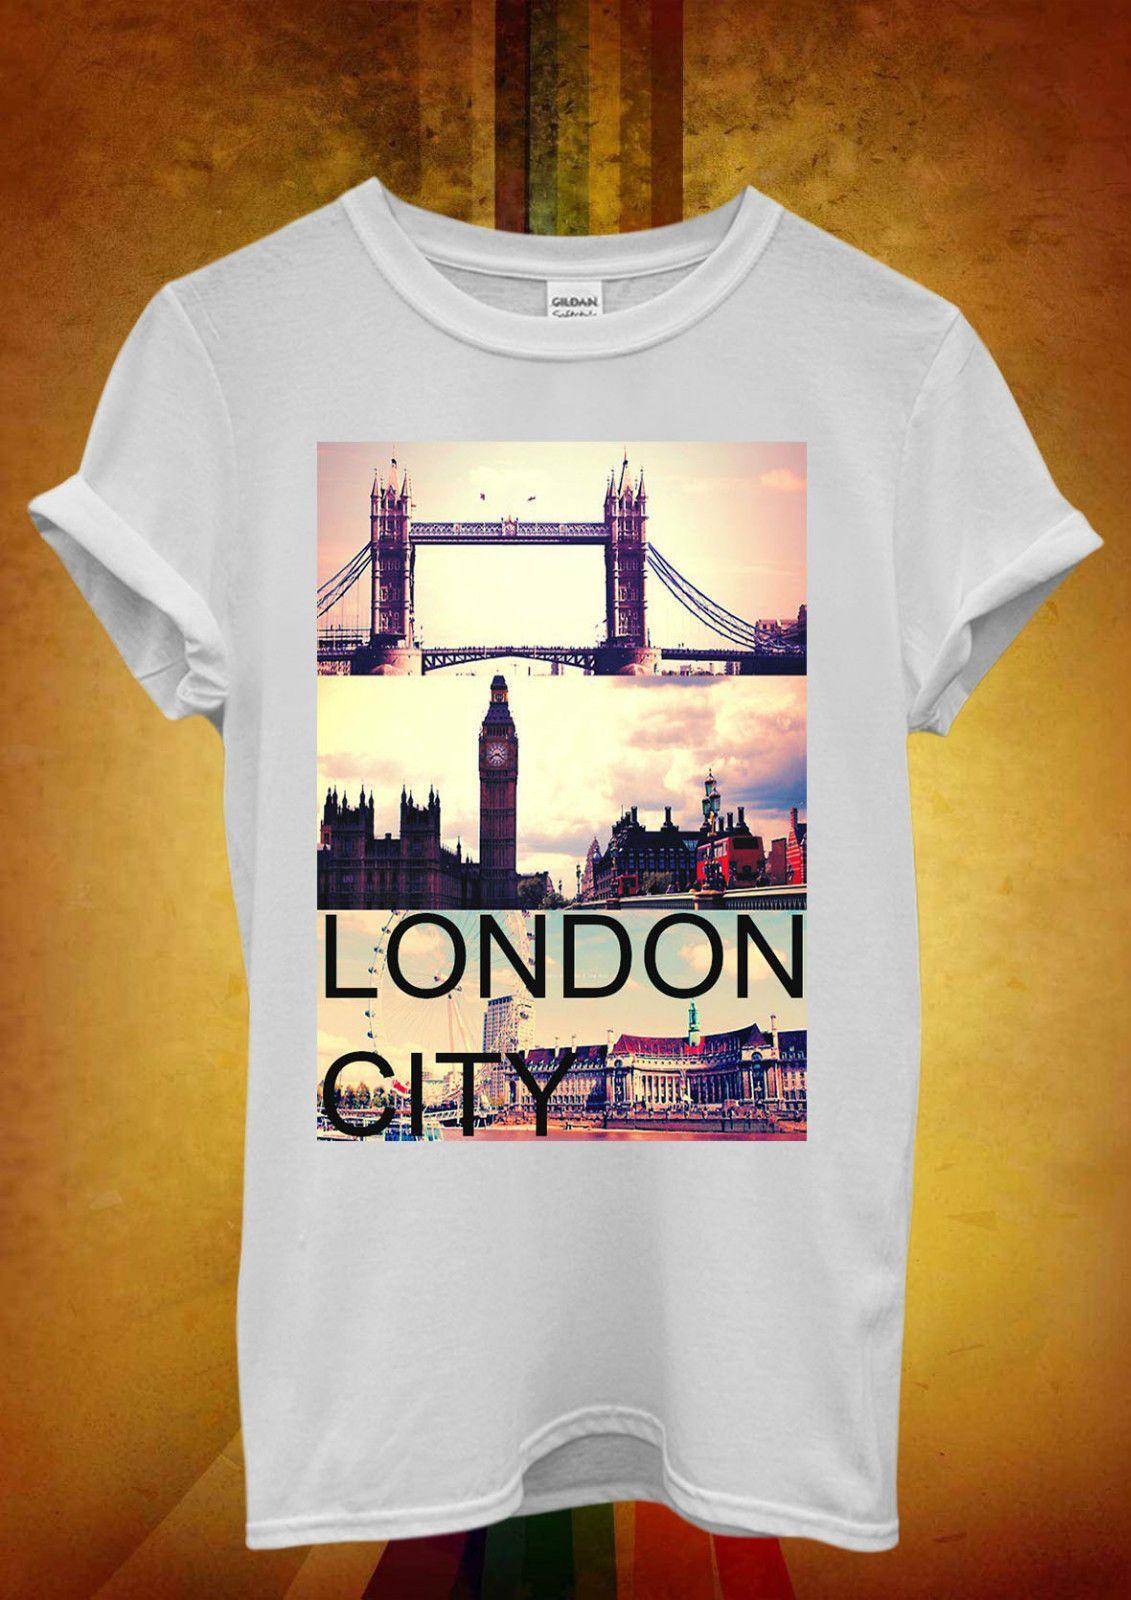 5fcf5b158 London City Big Ben Tower Bridge Men Women Unisex T Shirt Tank Top Vest 749  Mens Pride Dark T Shirt Funny Graphic T Shirts Funny T Shirts For Sale From  ...